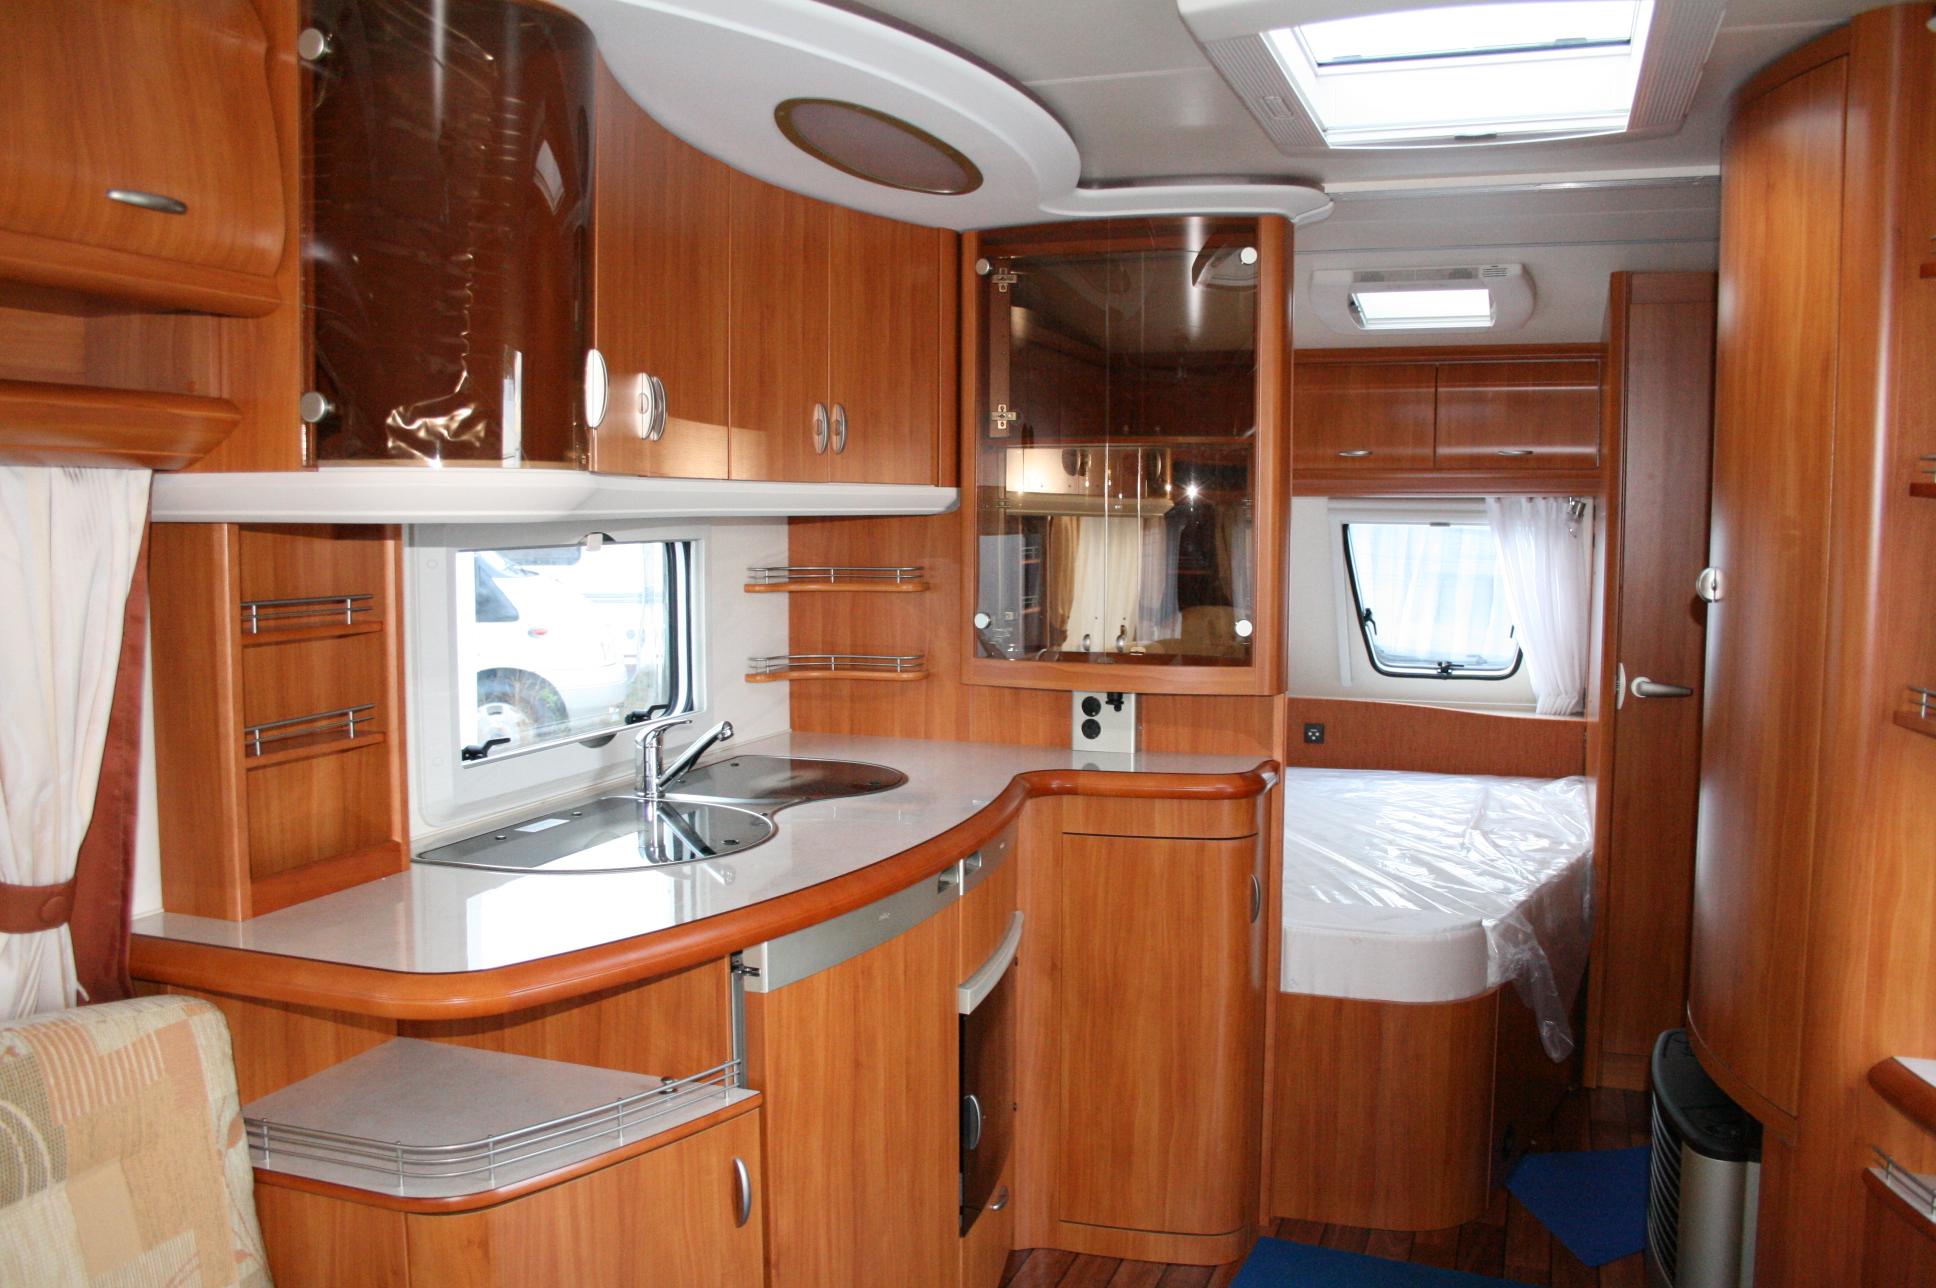 hobby 560 ufe excellent neuf de 2008 caravane en vente oberschaeffolsheim rhin 67. Black Bedroom Furniture Sets. Home Design Ideas